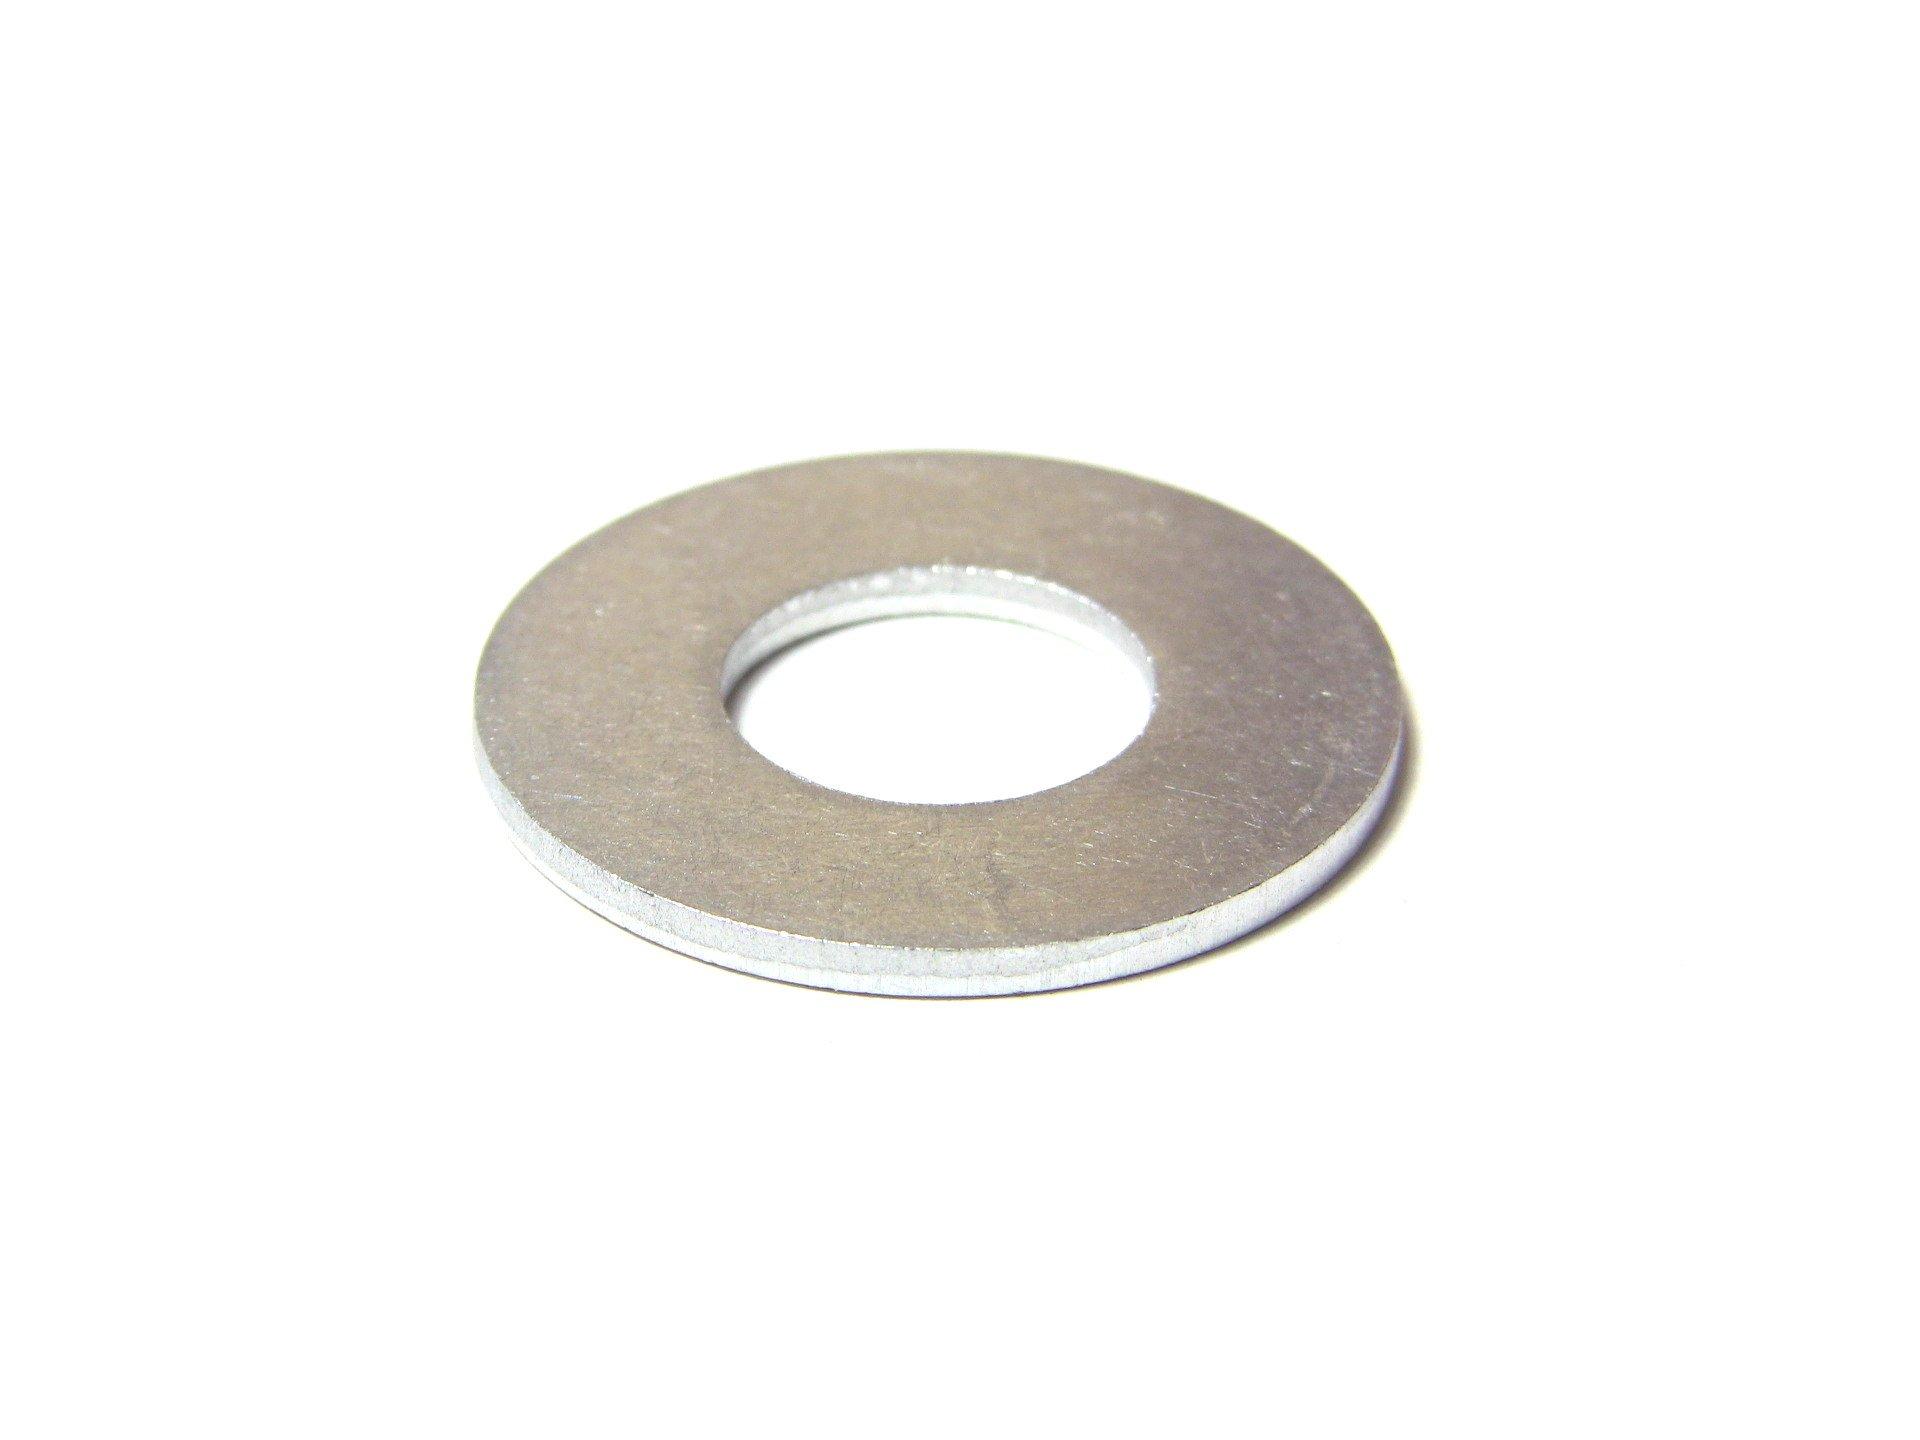 Aluminum Fastener Flat Washer 5/8 (1.5 OD x .687 ID) | UAAC (100pcs)